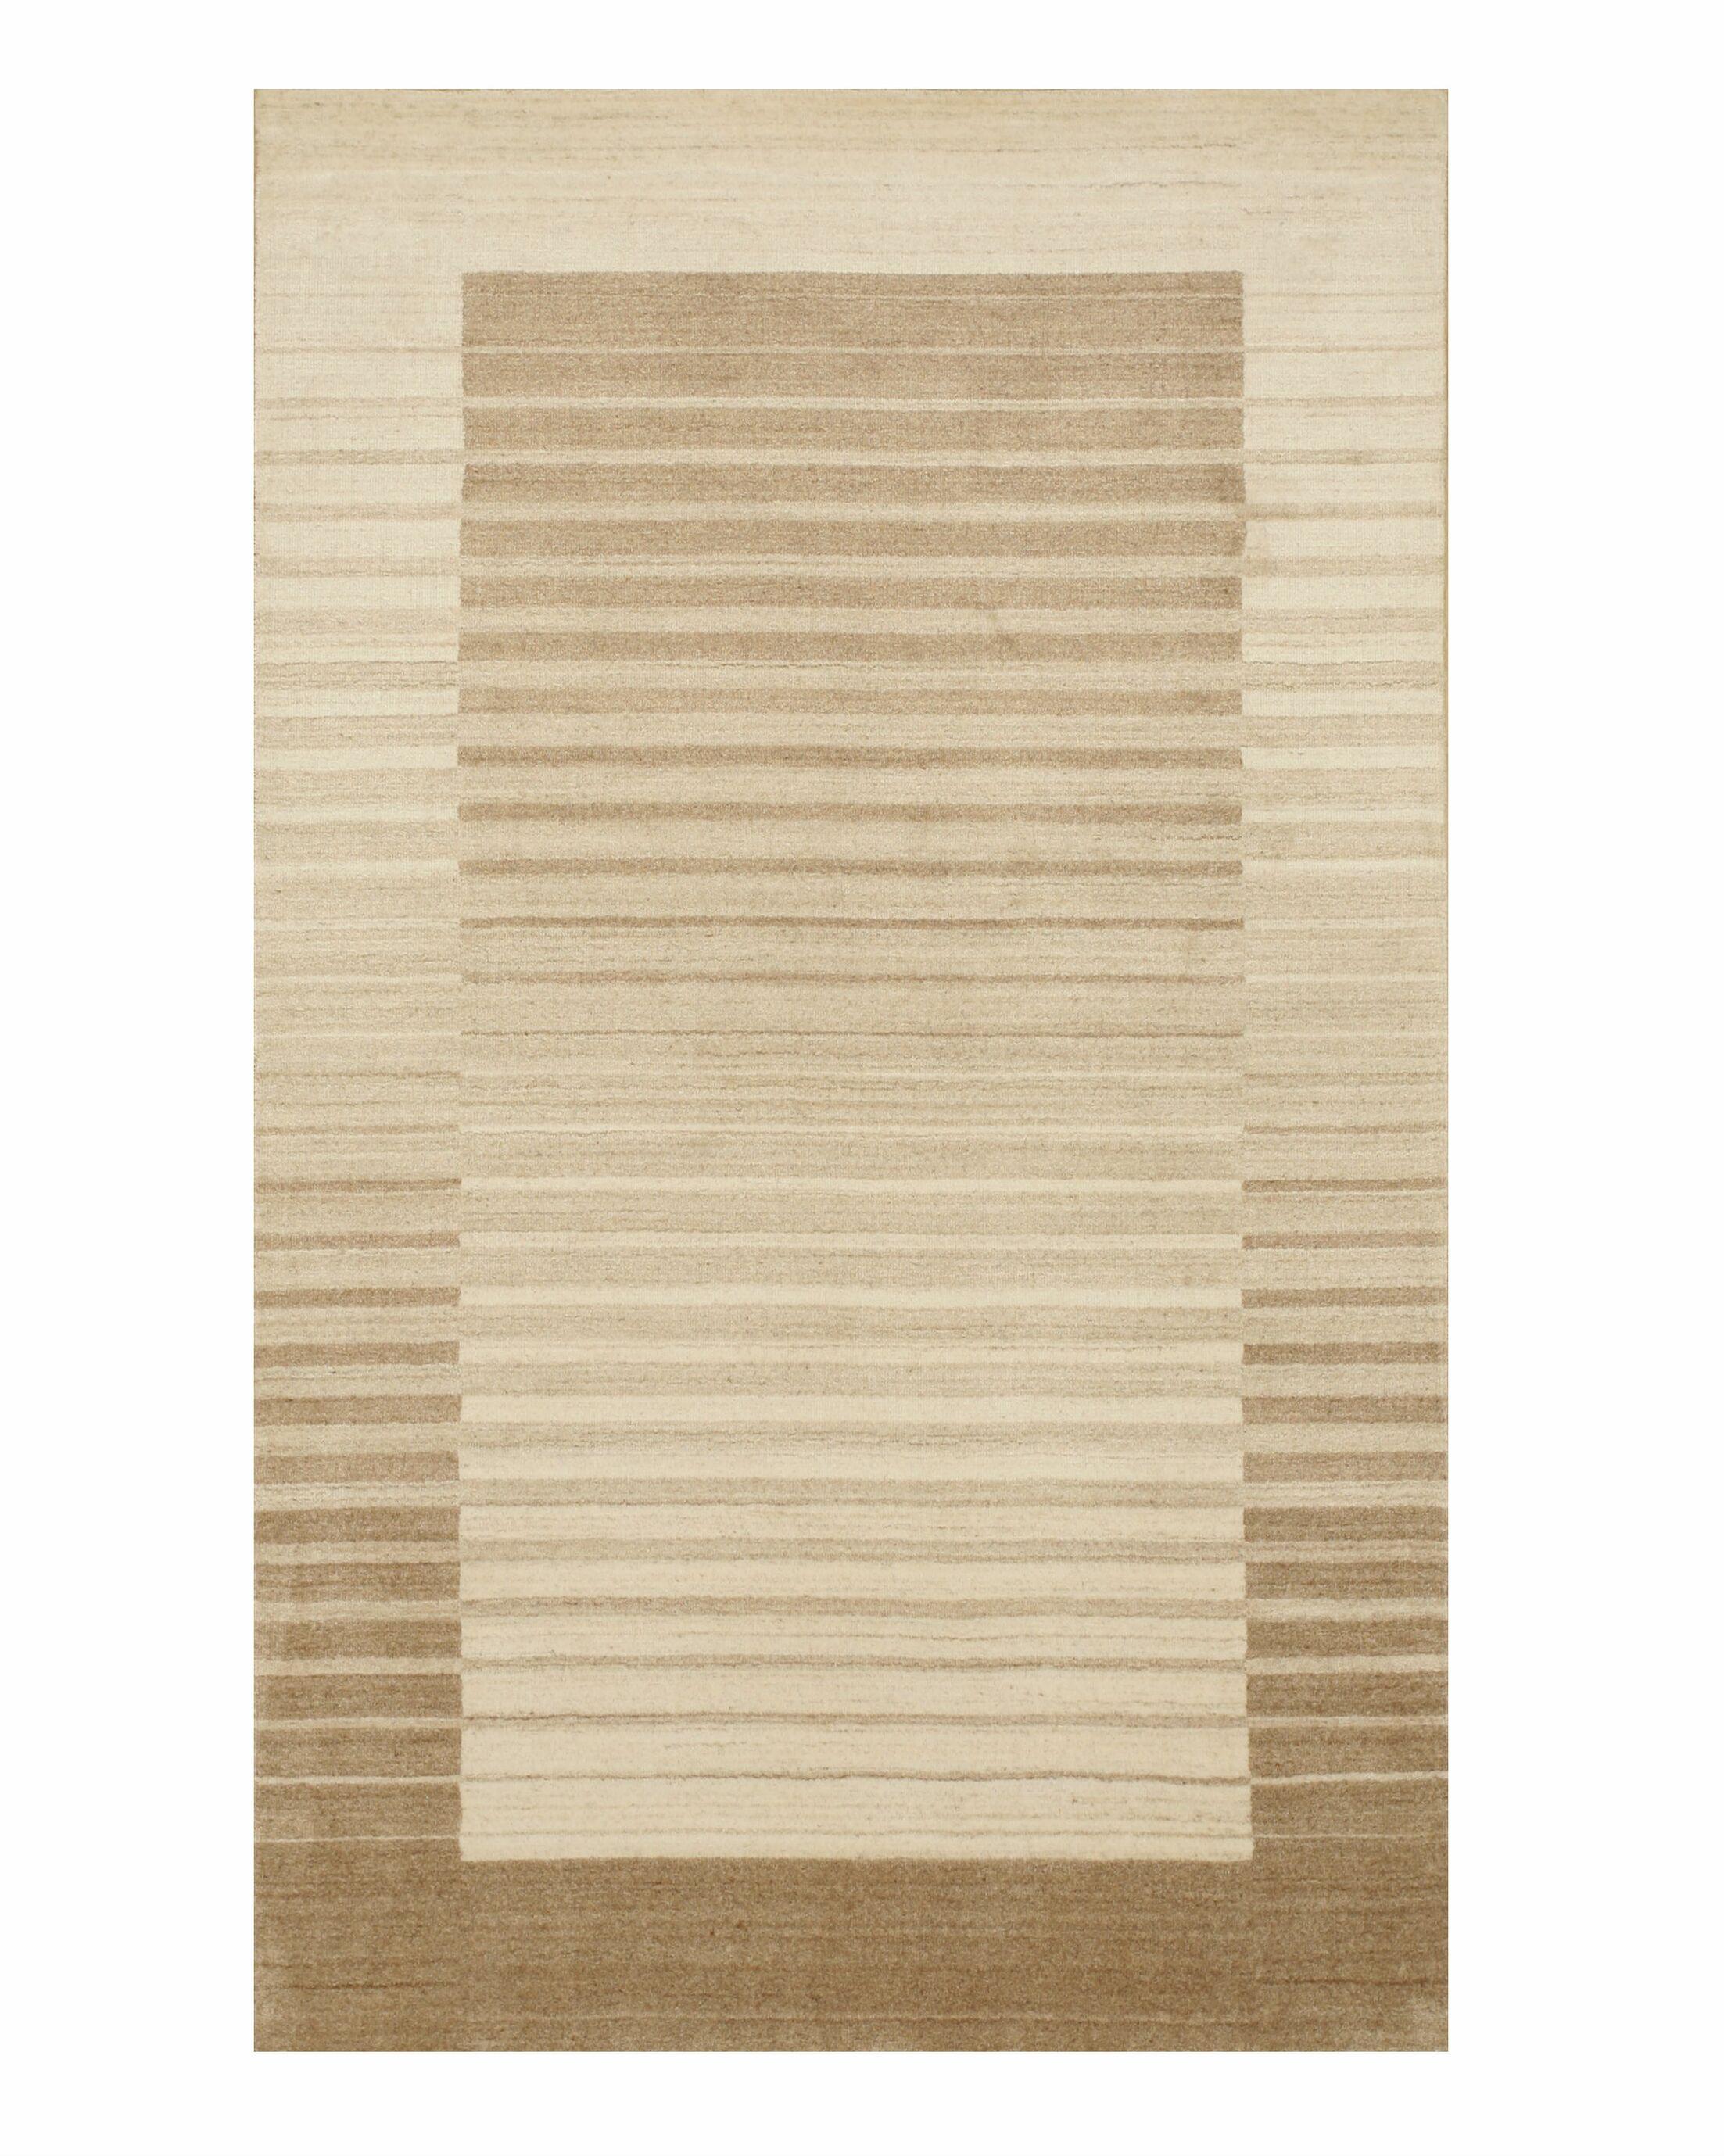 Kelbark Hand-Woven Wool Beige Area Rug Rug Size: 8' x 10'